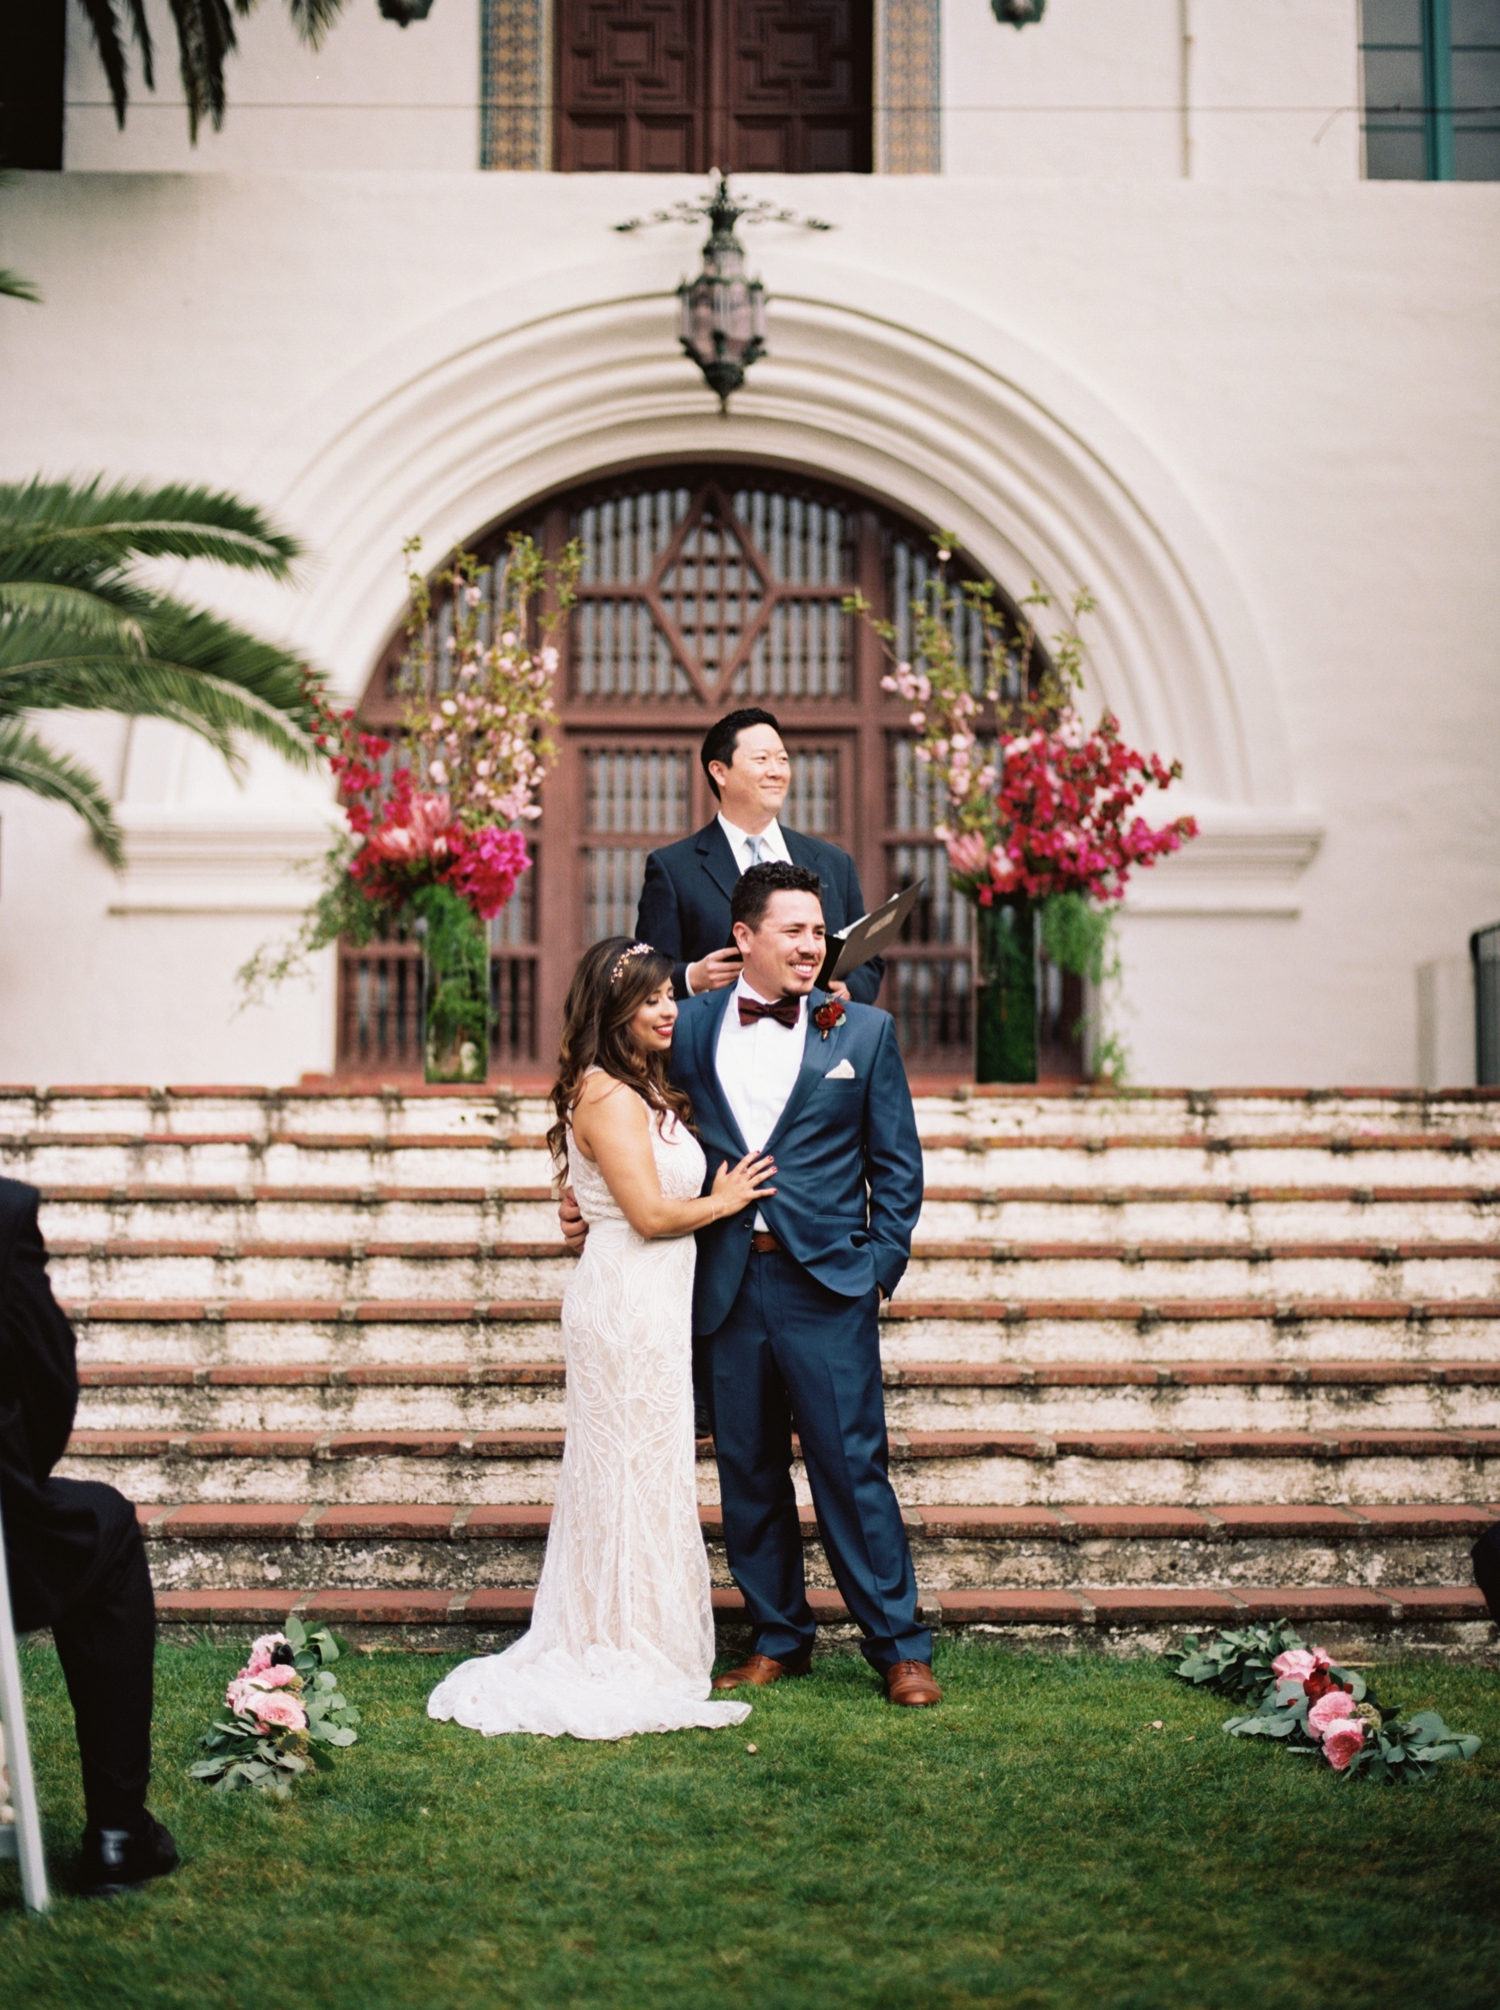 anna santa barbara wedding anna greg czar goss photo 24.jpg